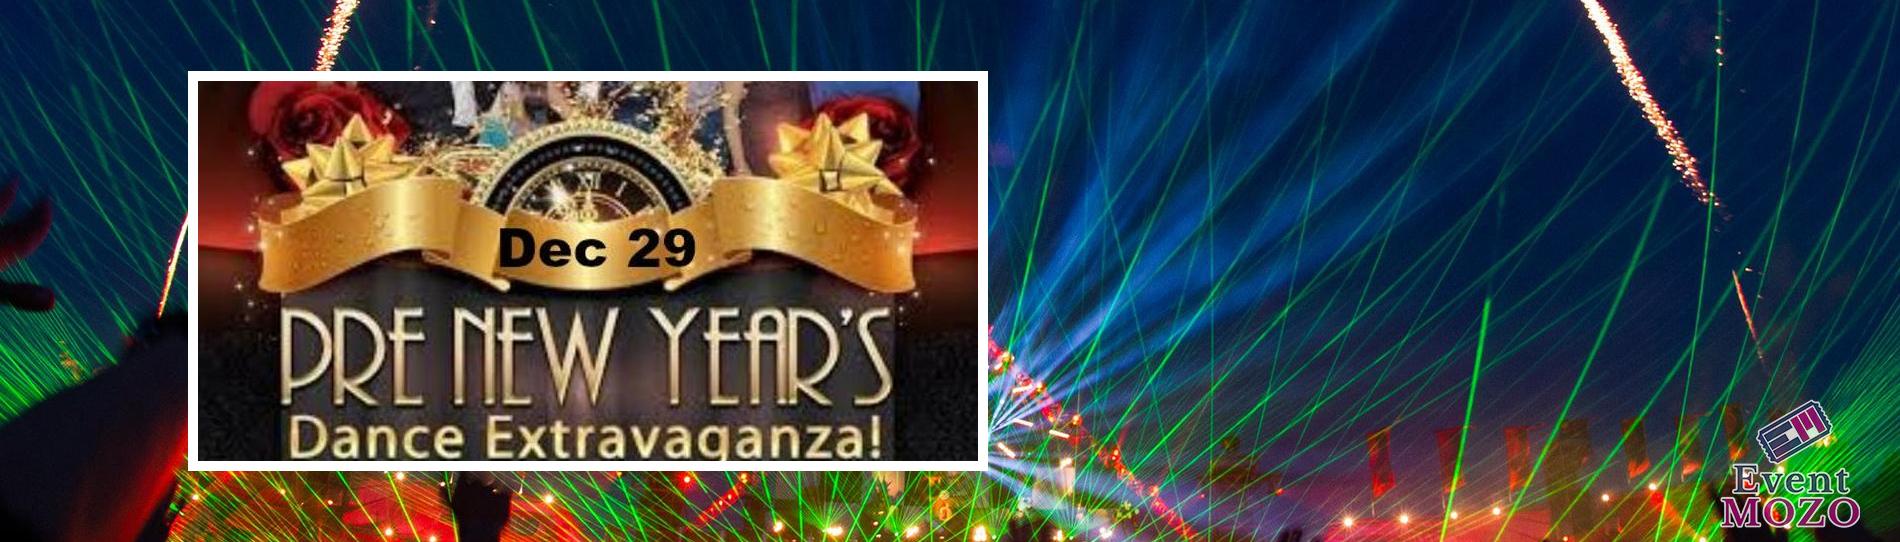 EventMozo Pre-New Years Eve Singles Dance Extravaganza